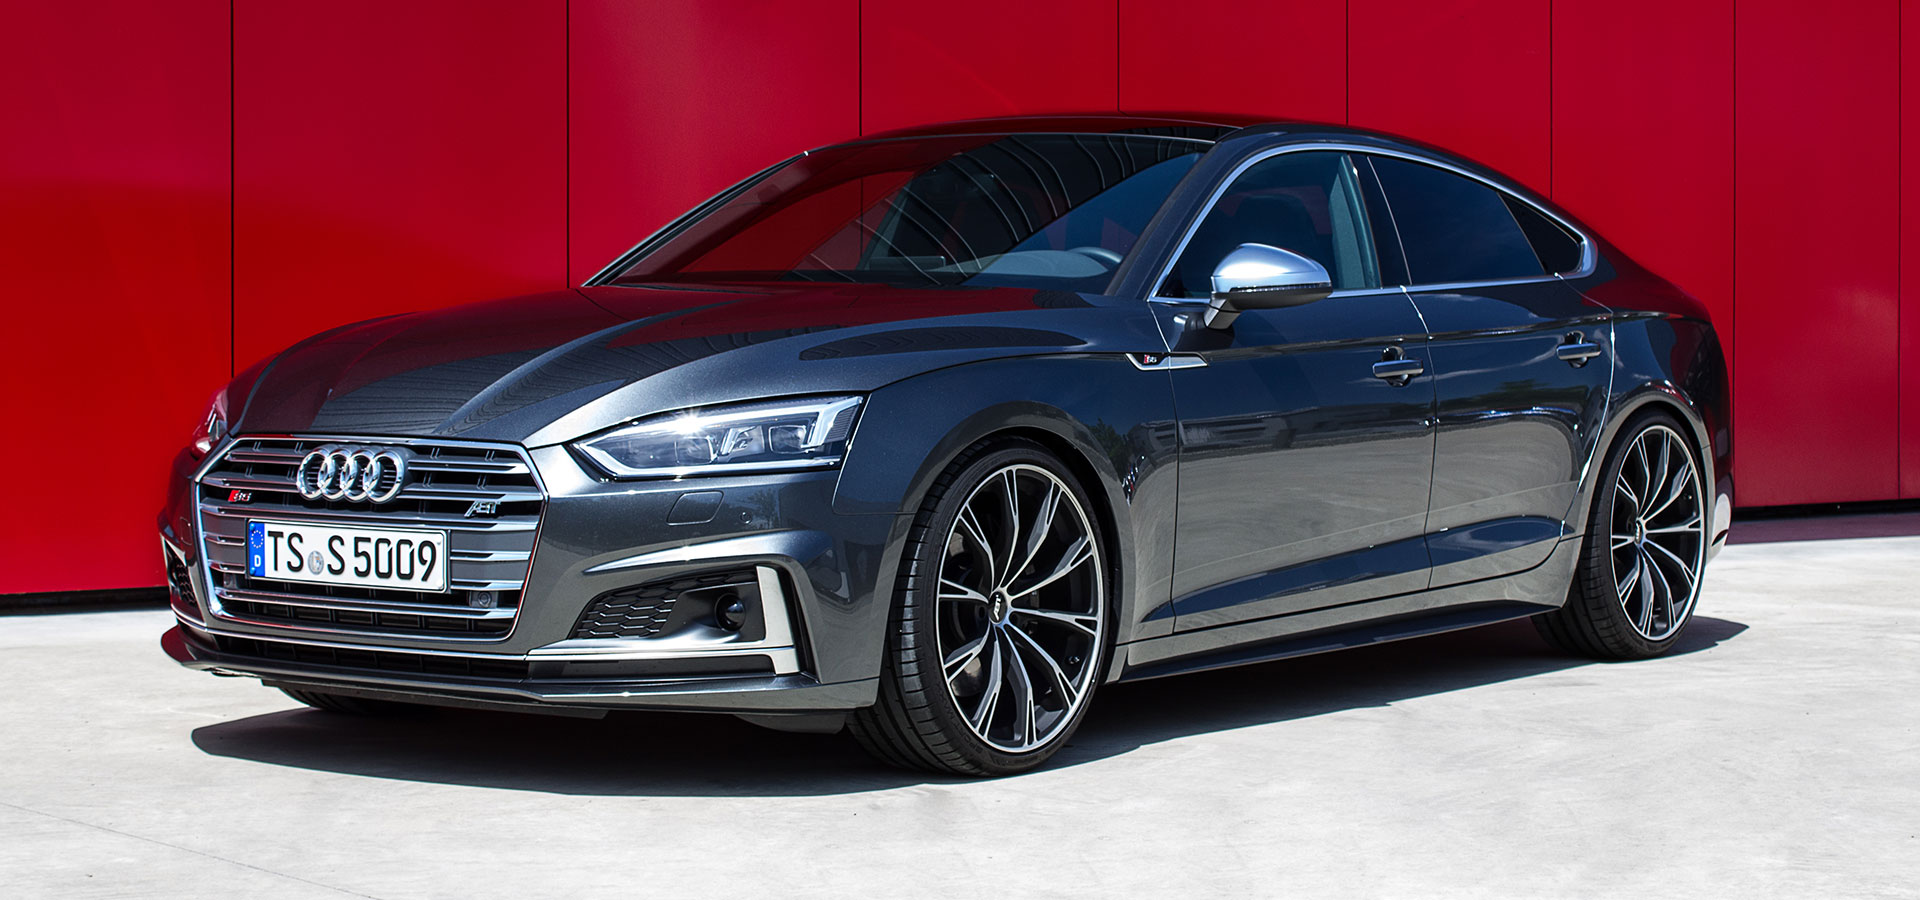 Audi S5 Abt Sportsline